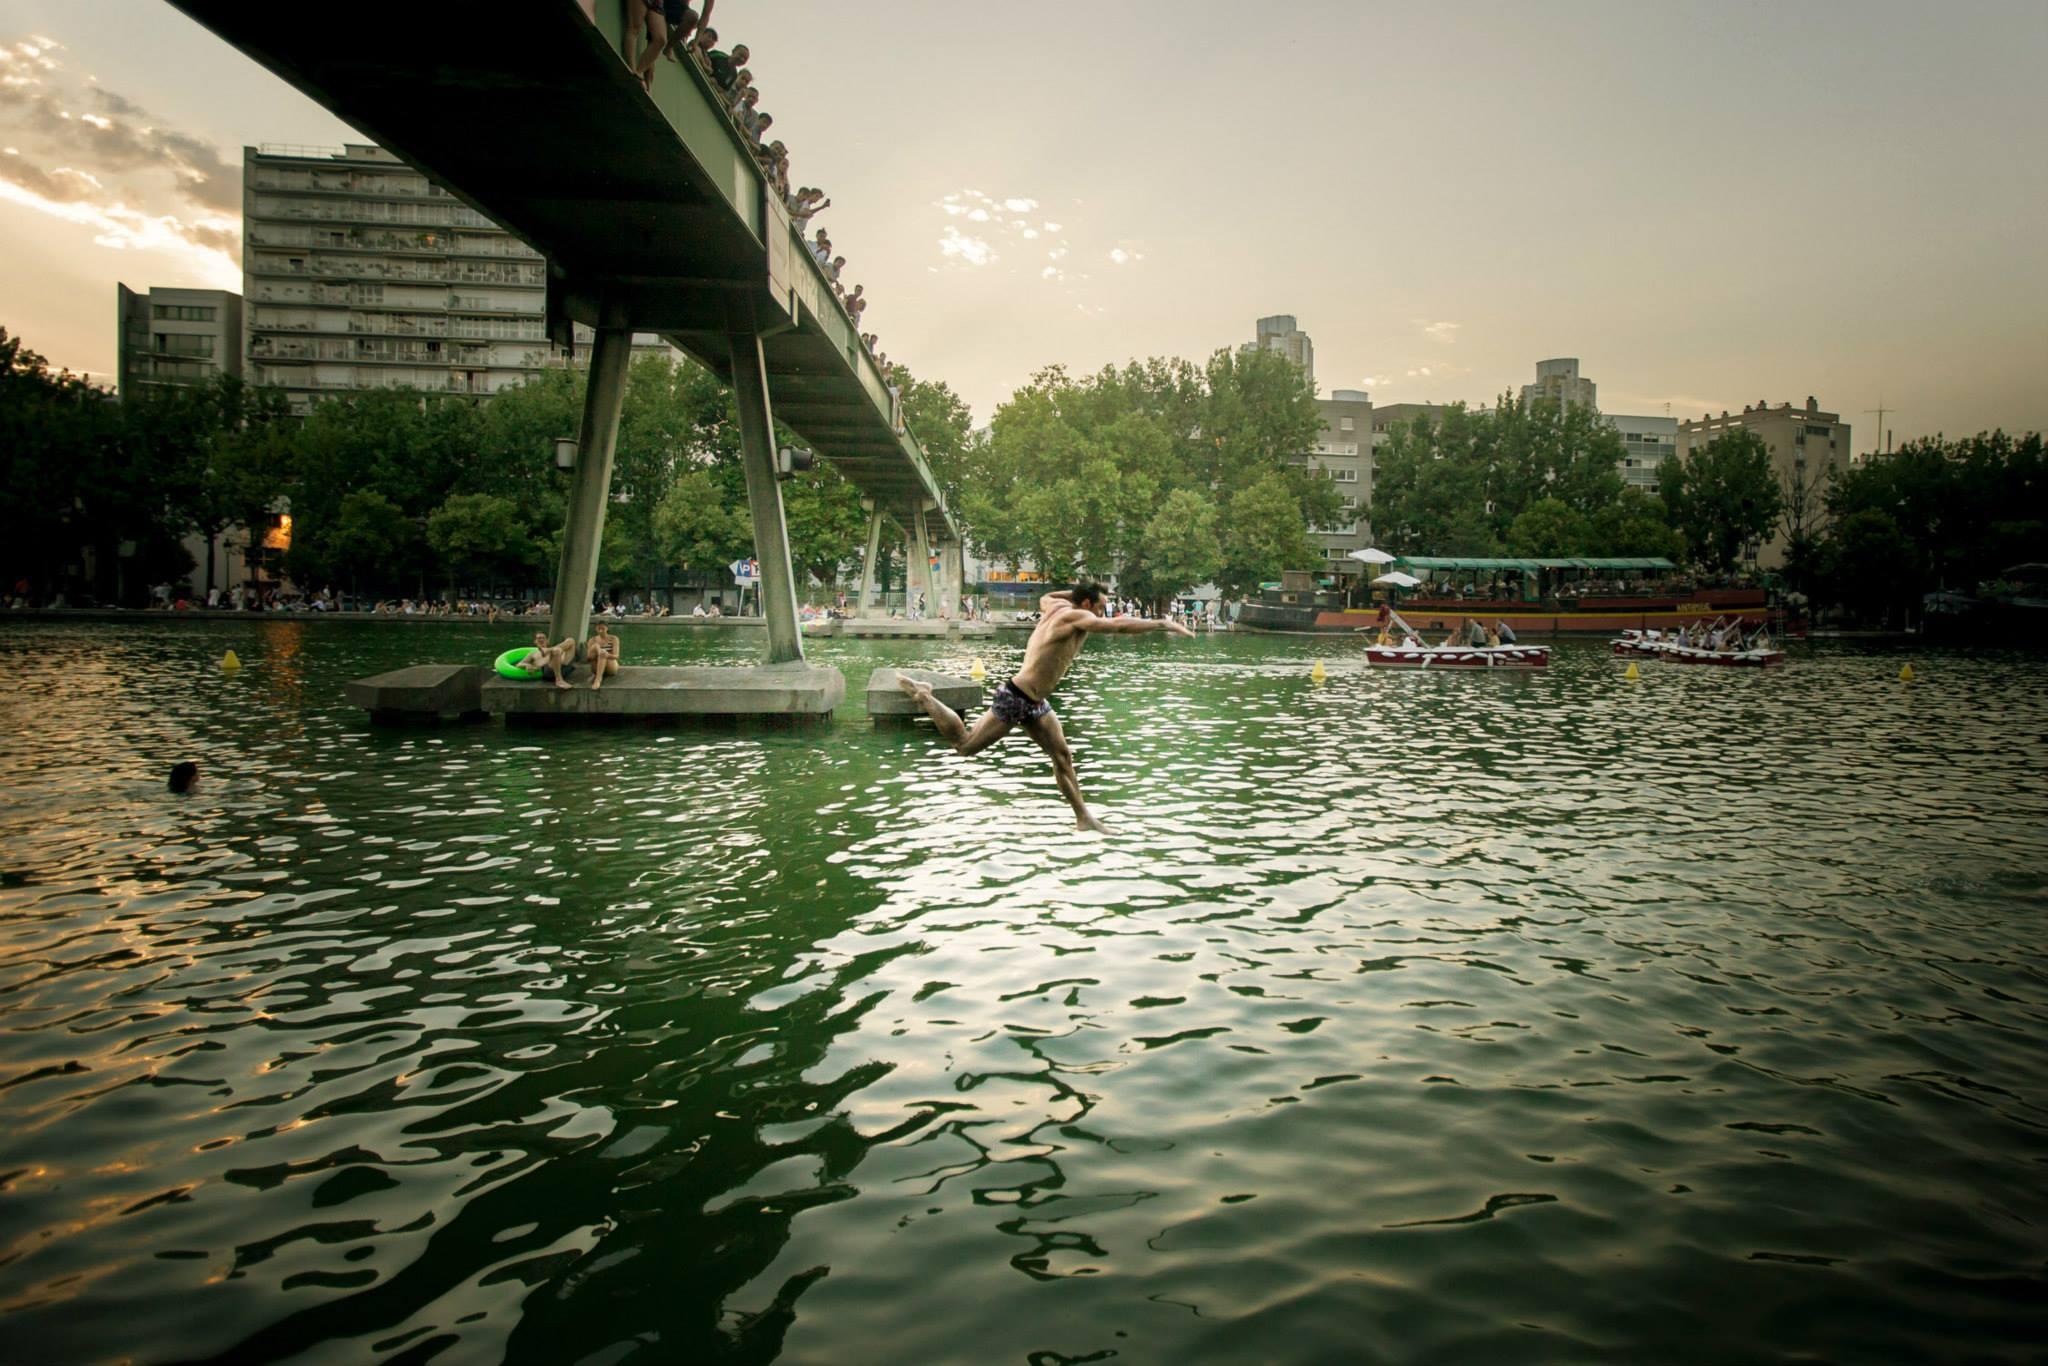 Alex Barnab Voyerjpg - Les Baignades urbaines, une activité Seine !